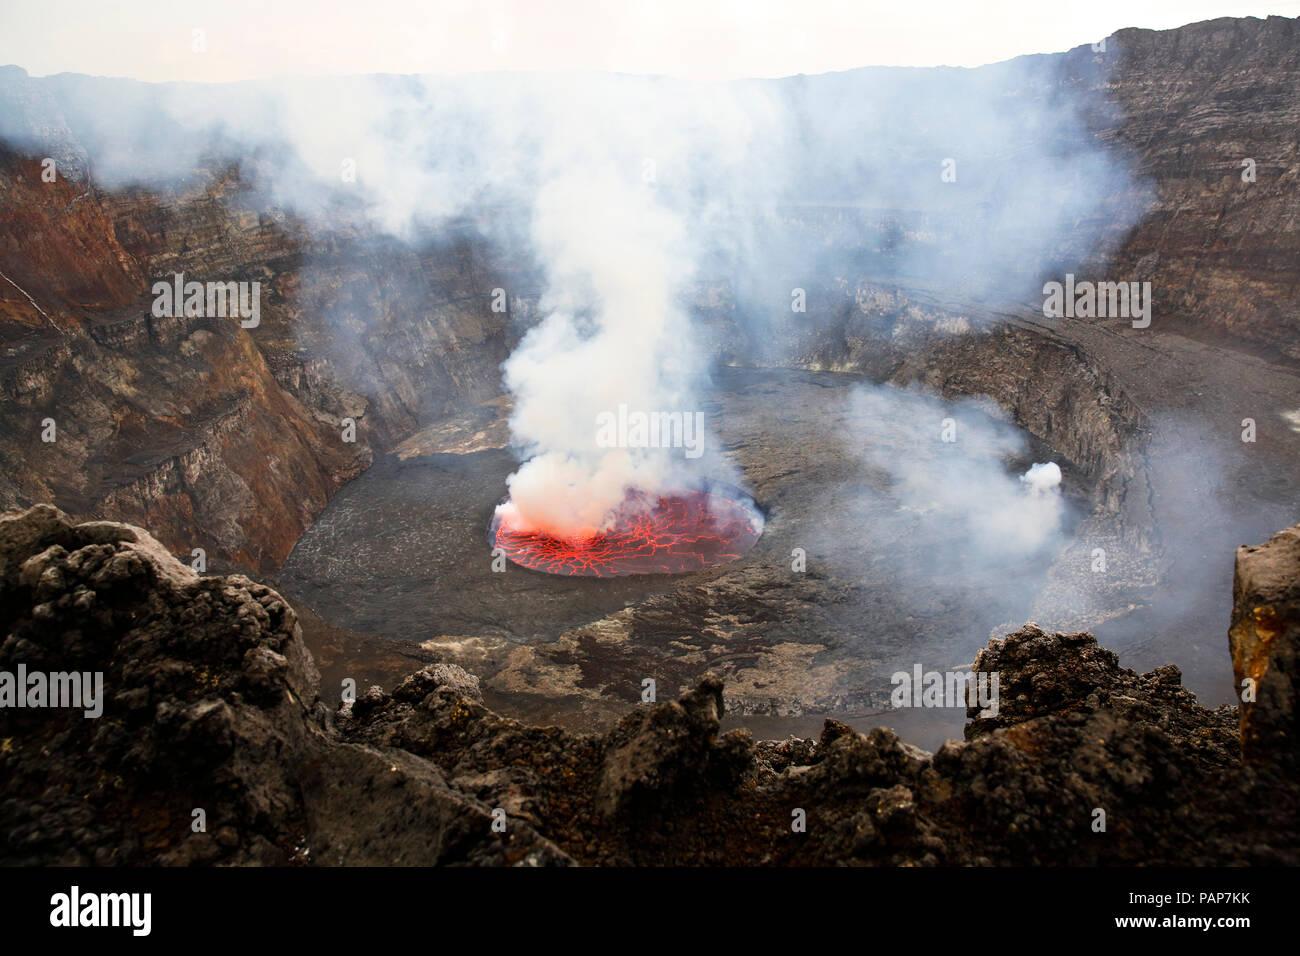 Africa, Democratic Republic of Congo, Virunga National Park, Nyiragongo volcano - Stock Image